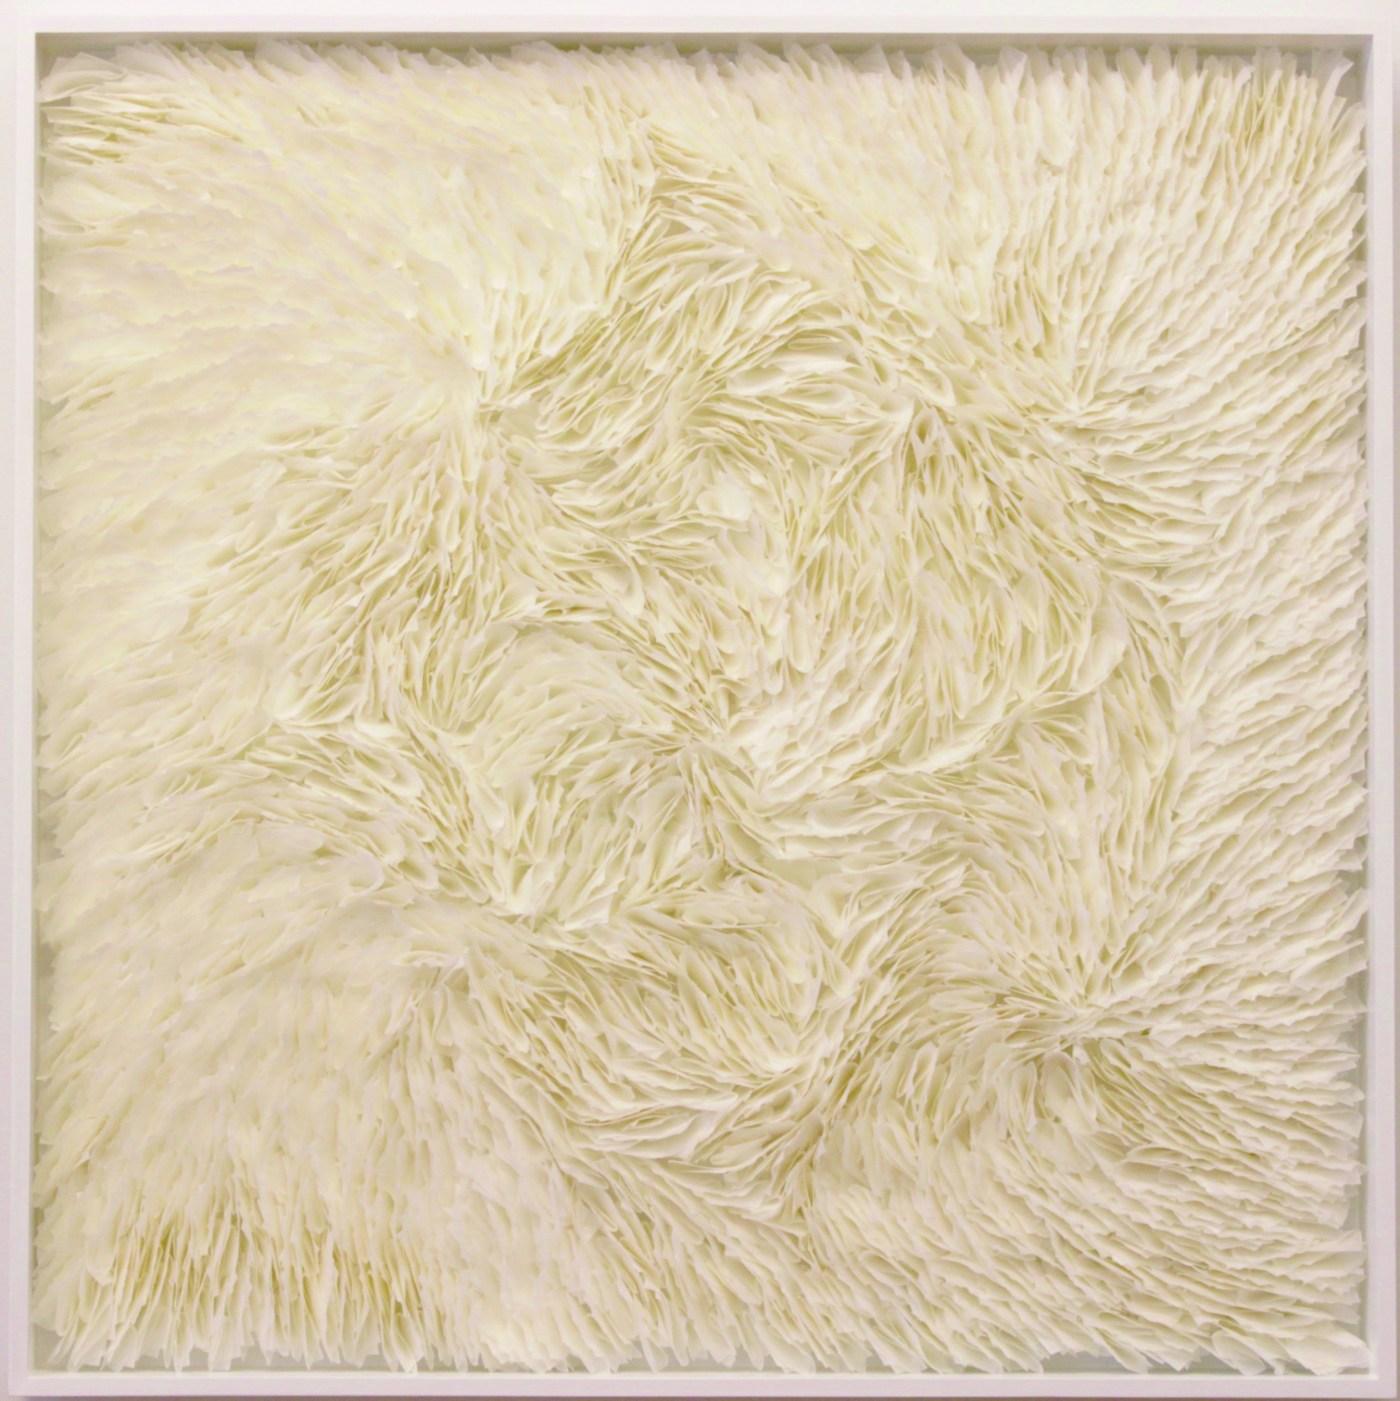 ART TAIPEI 2019 highlight - Rakuko Naito_ Untitled (RN936-3-1_2-16)_Japanese p…_91.5 x91.5 x 8.9 cm_2106 Courtesy of Whitestone Gallery| 日本東京